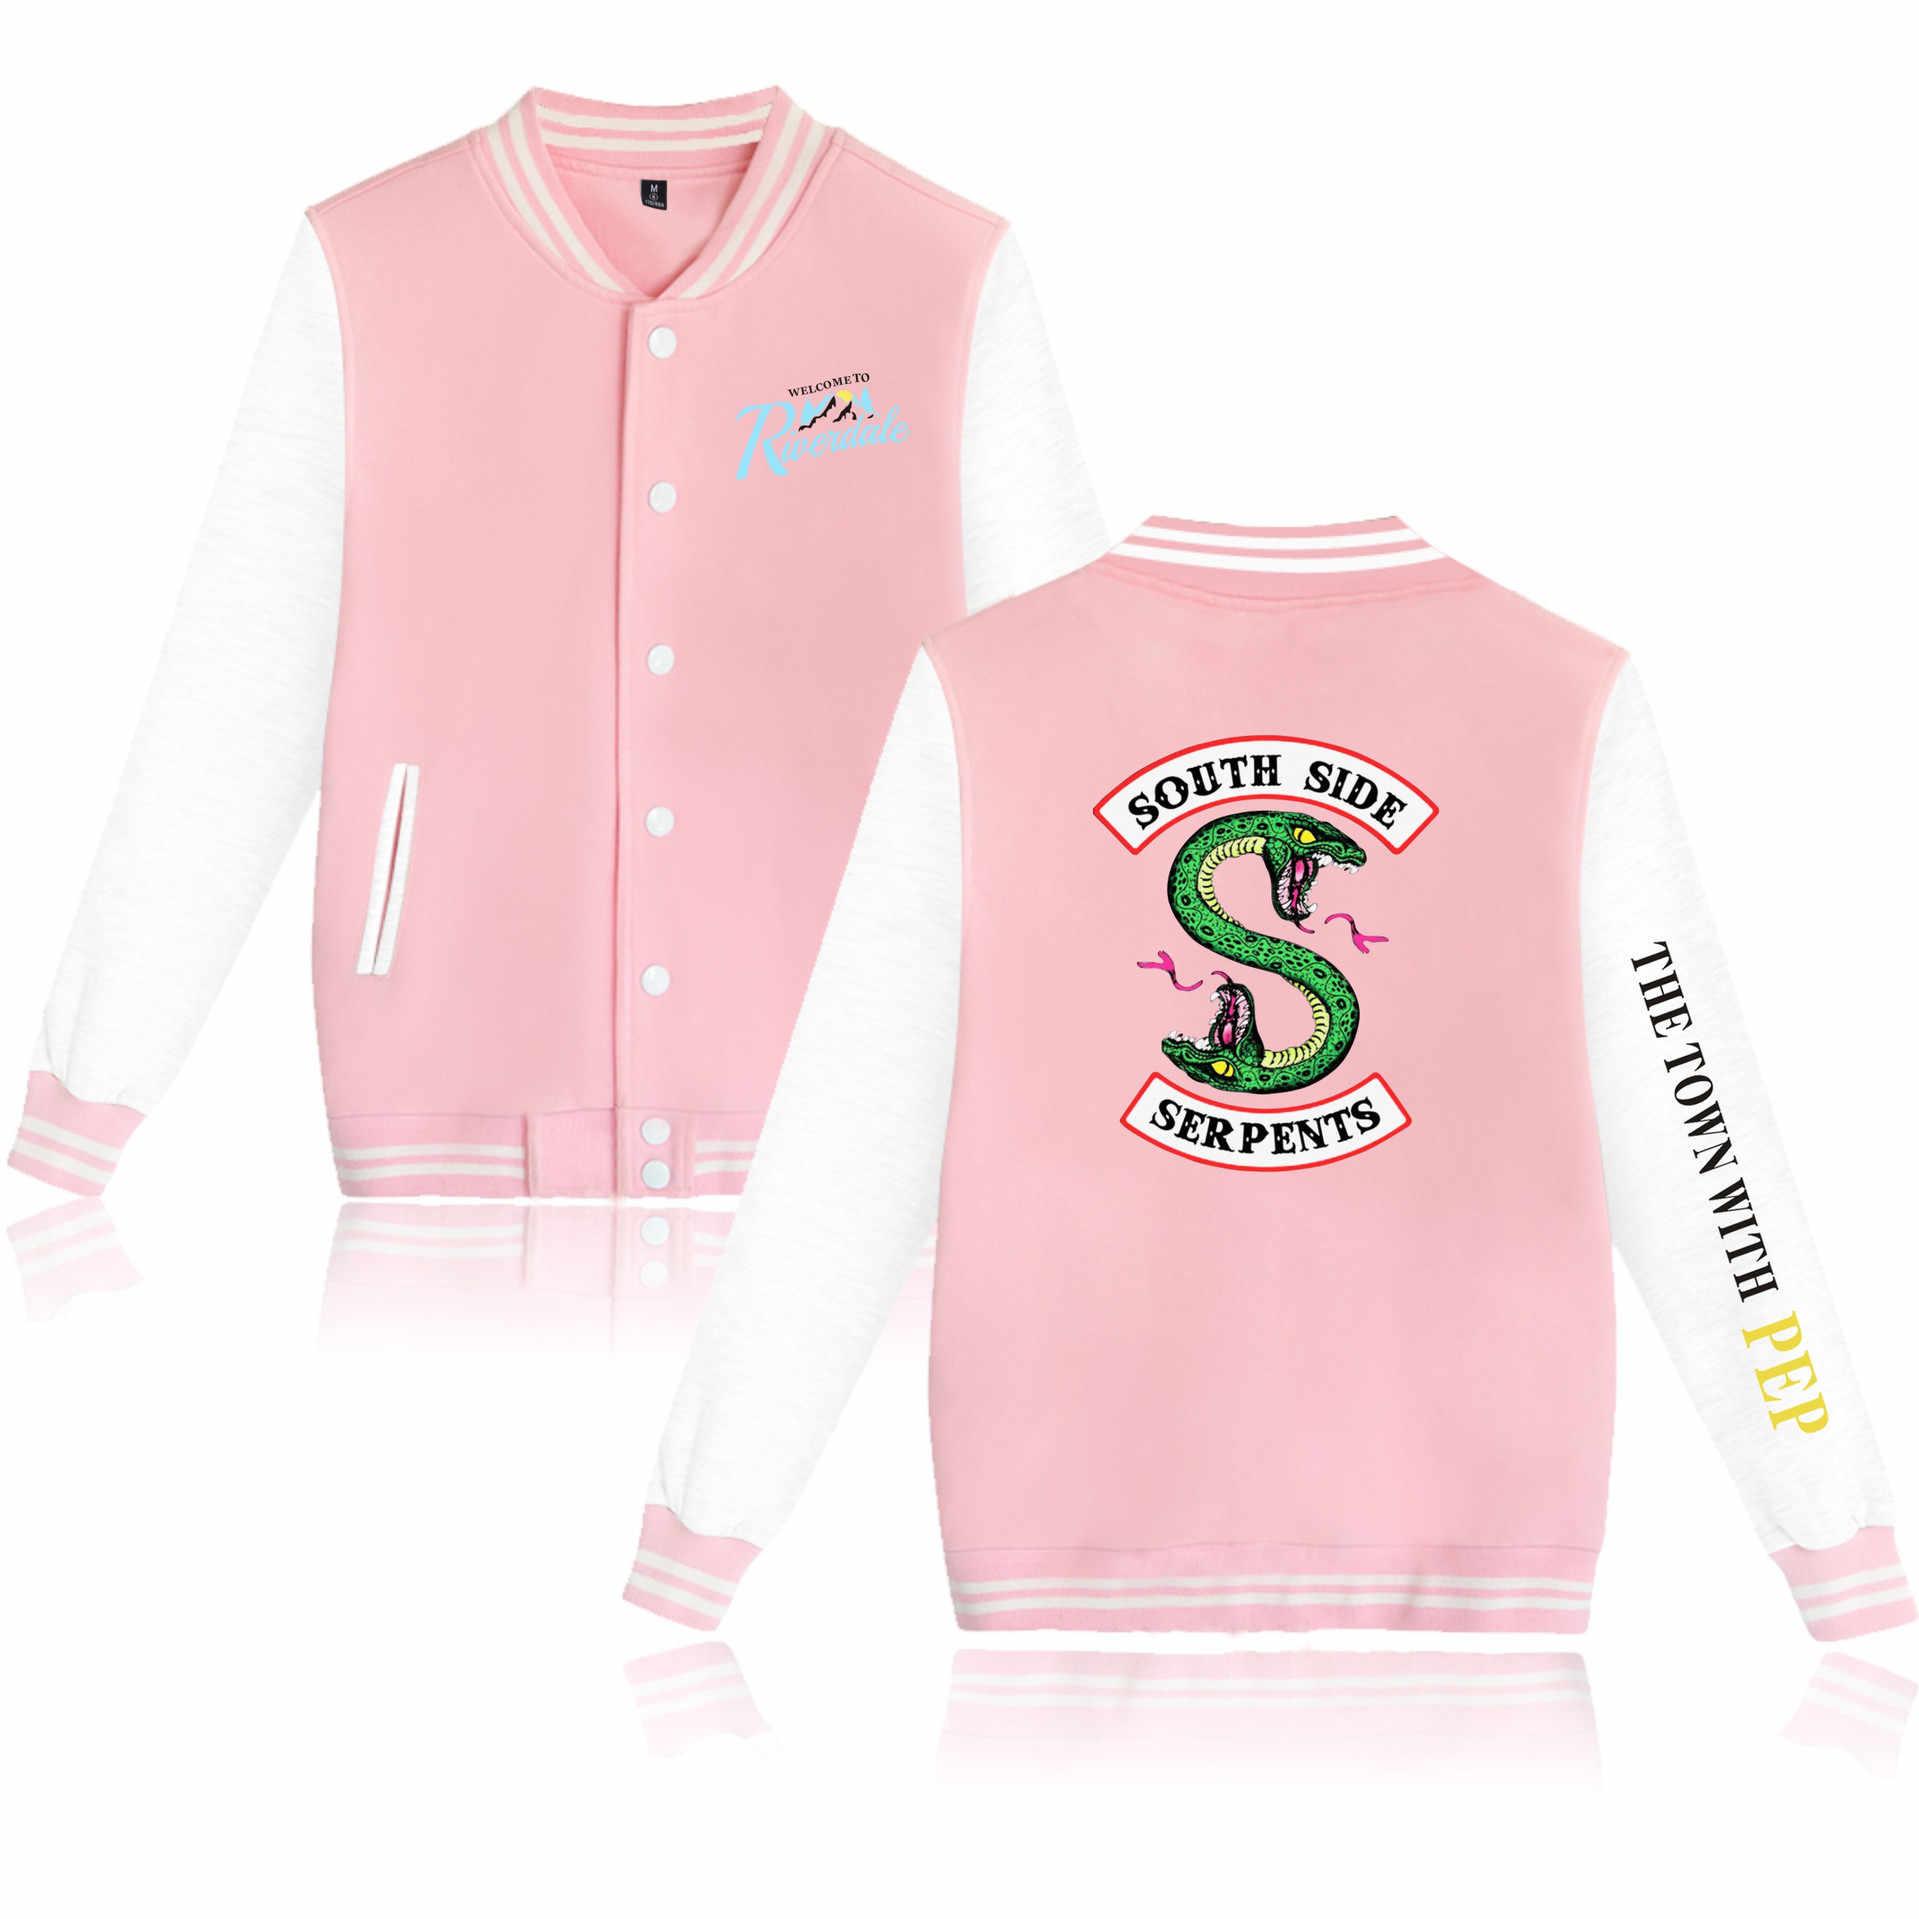 Waidx Southside Riverdale Serpents Baseball Snake Girl Jackets Sweatshirt Women Button   Pocket Streetwear Drop Shipping